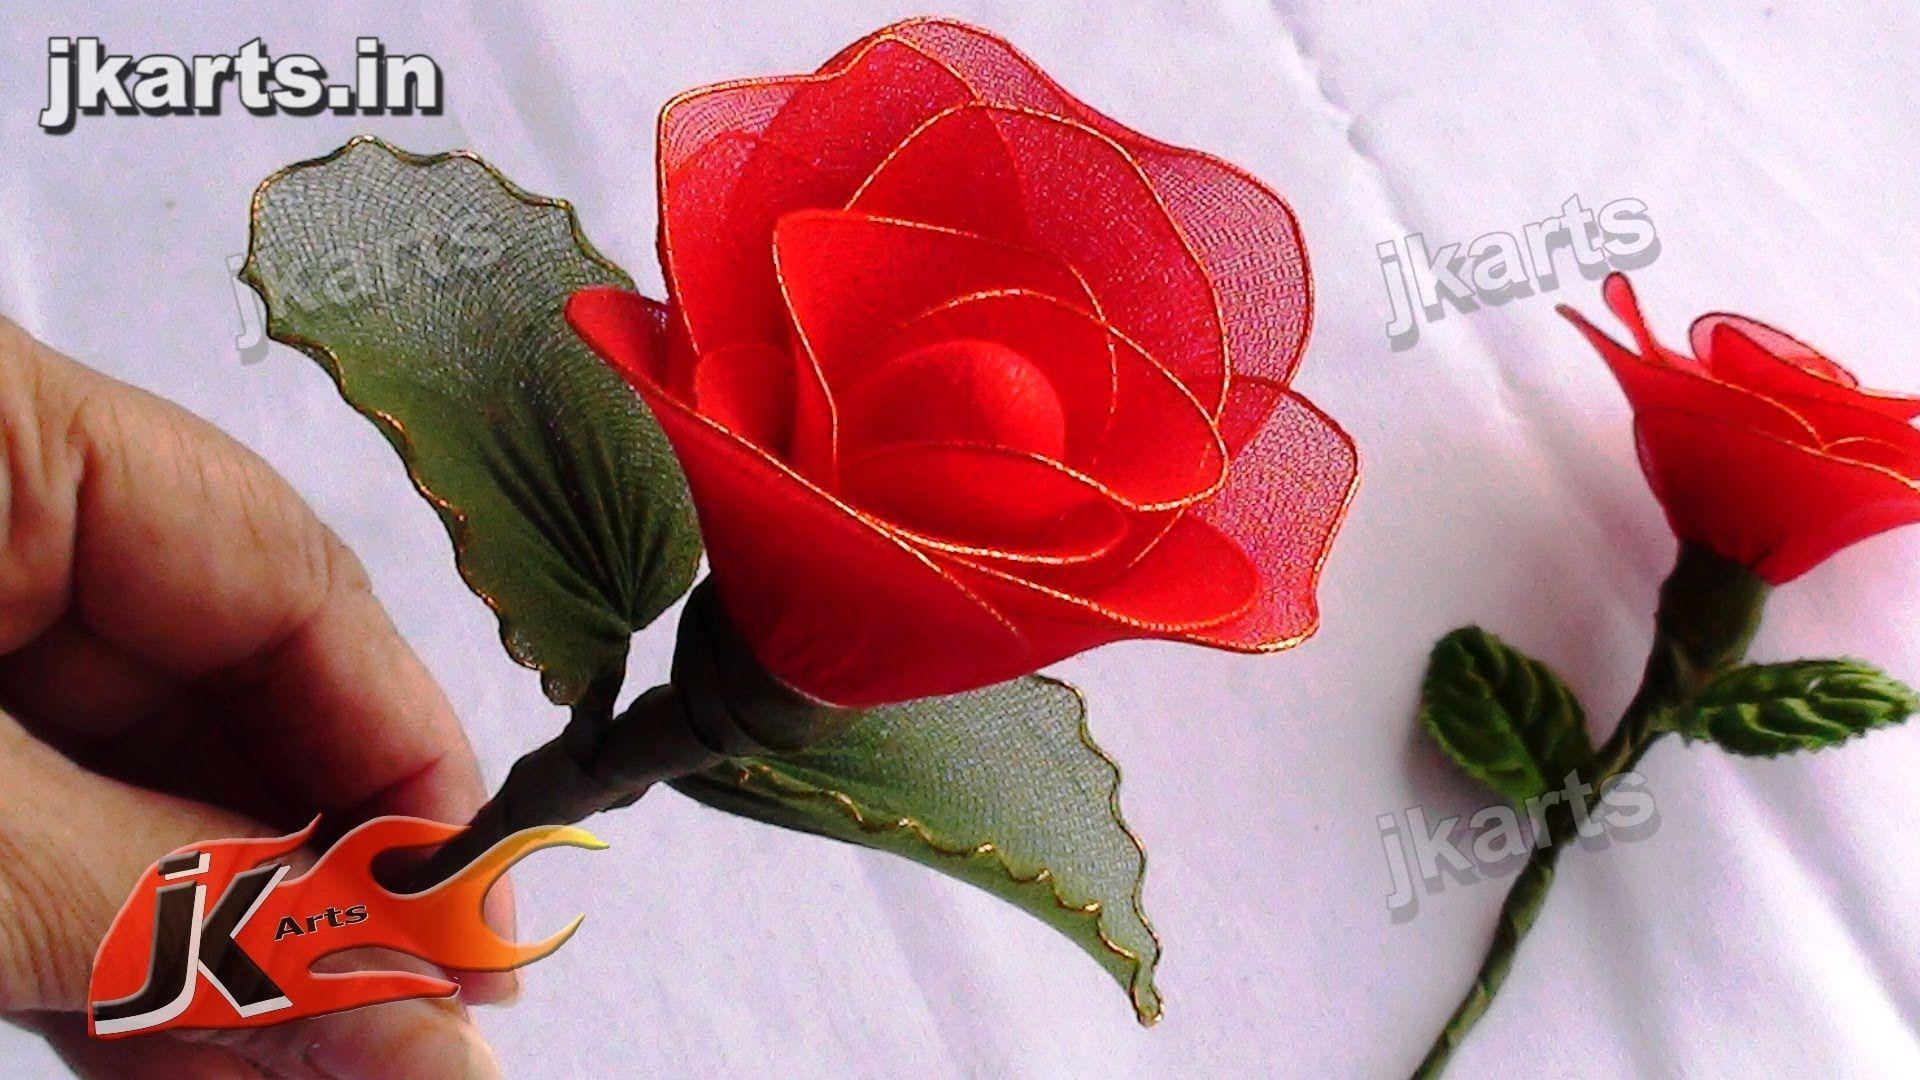 Diy How To Make Rose Stocking Flower Jk Arts 091 Paper Flowers